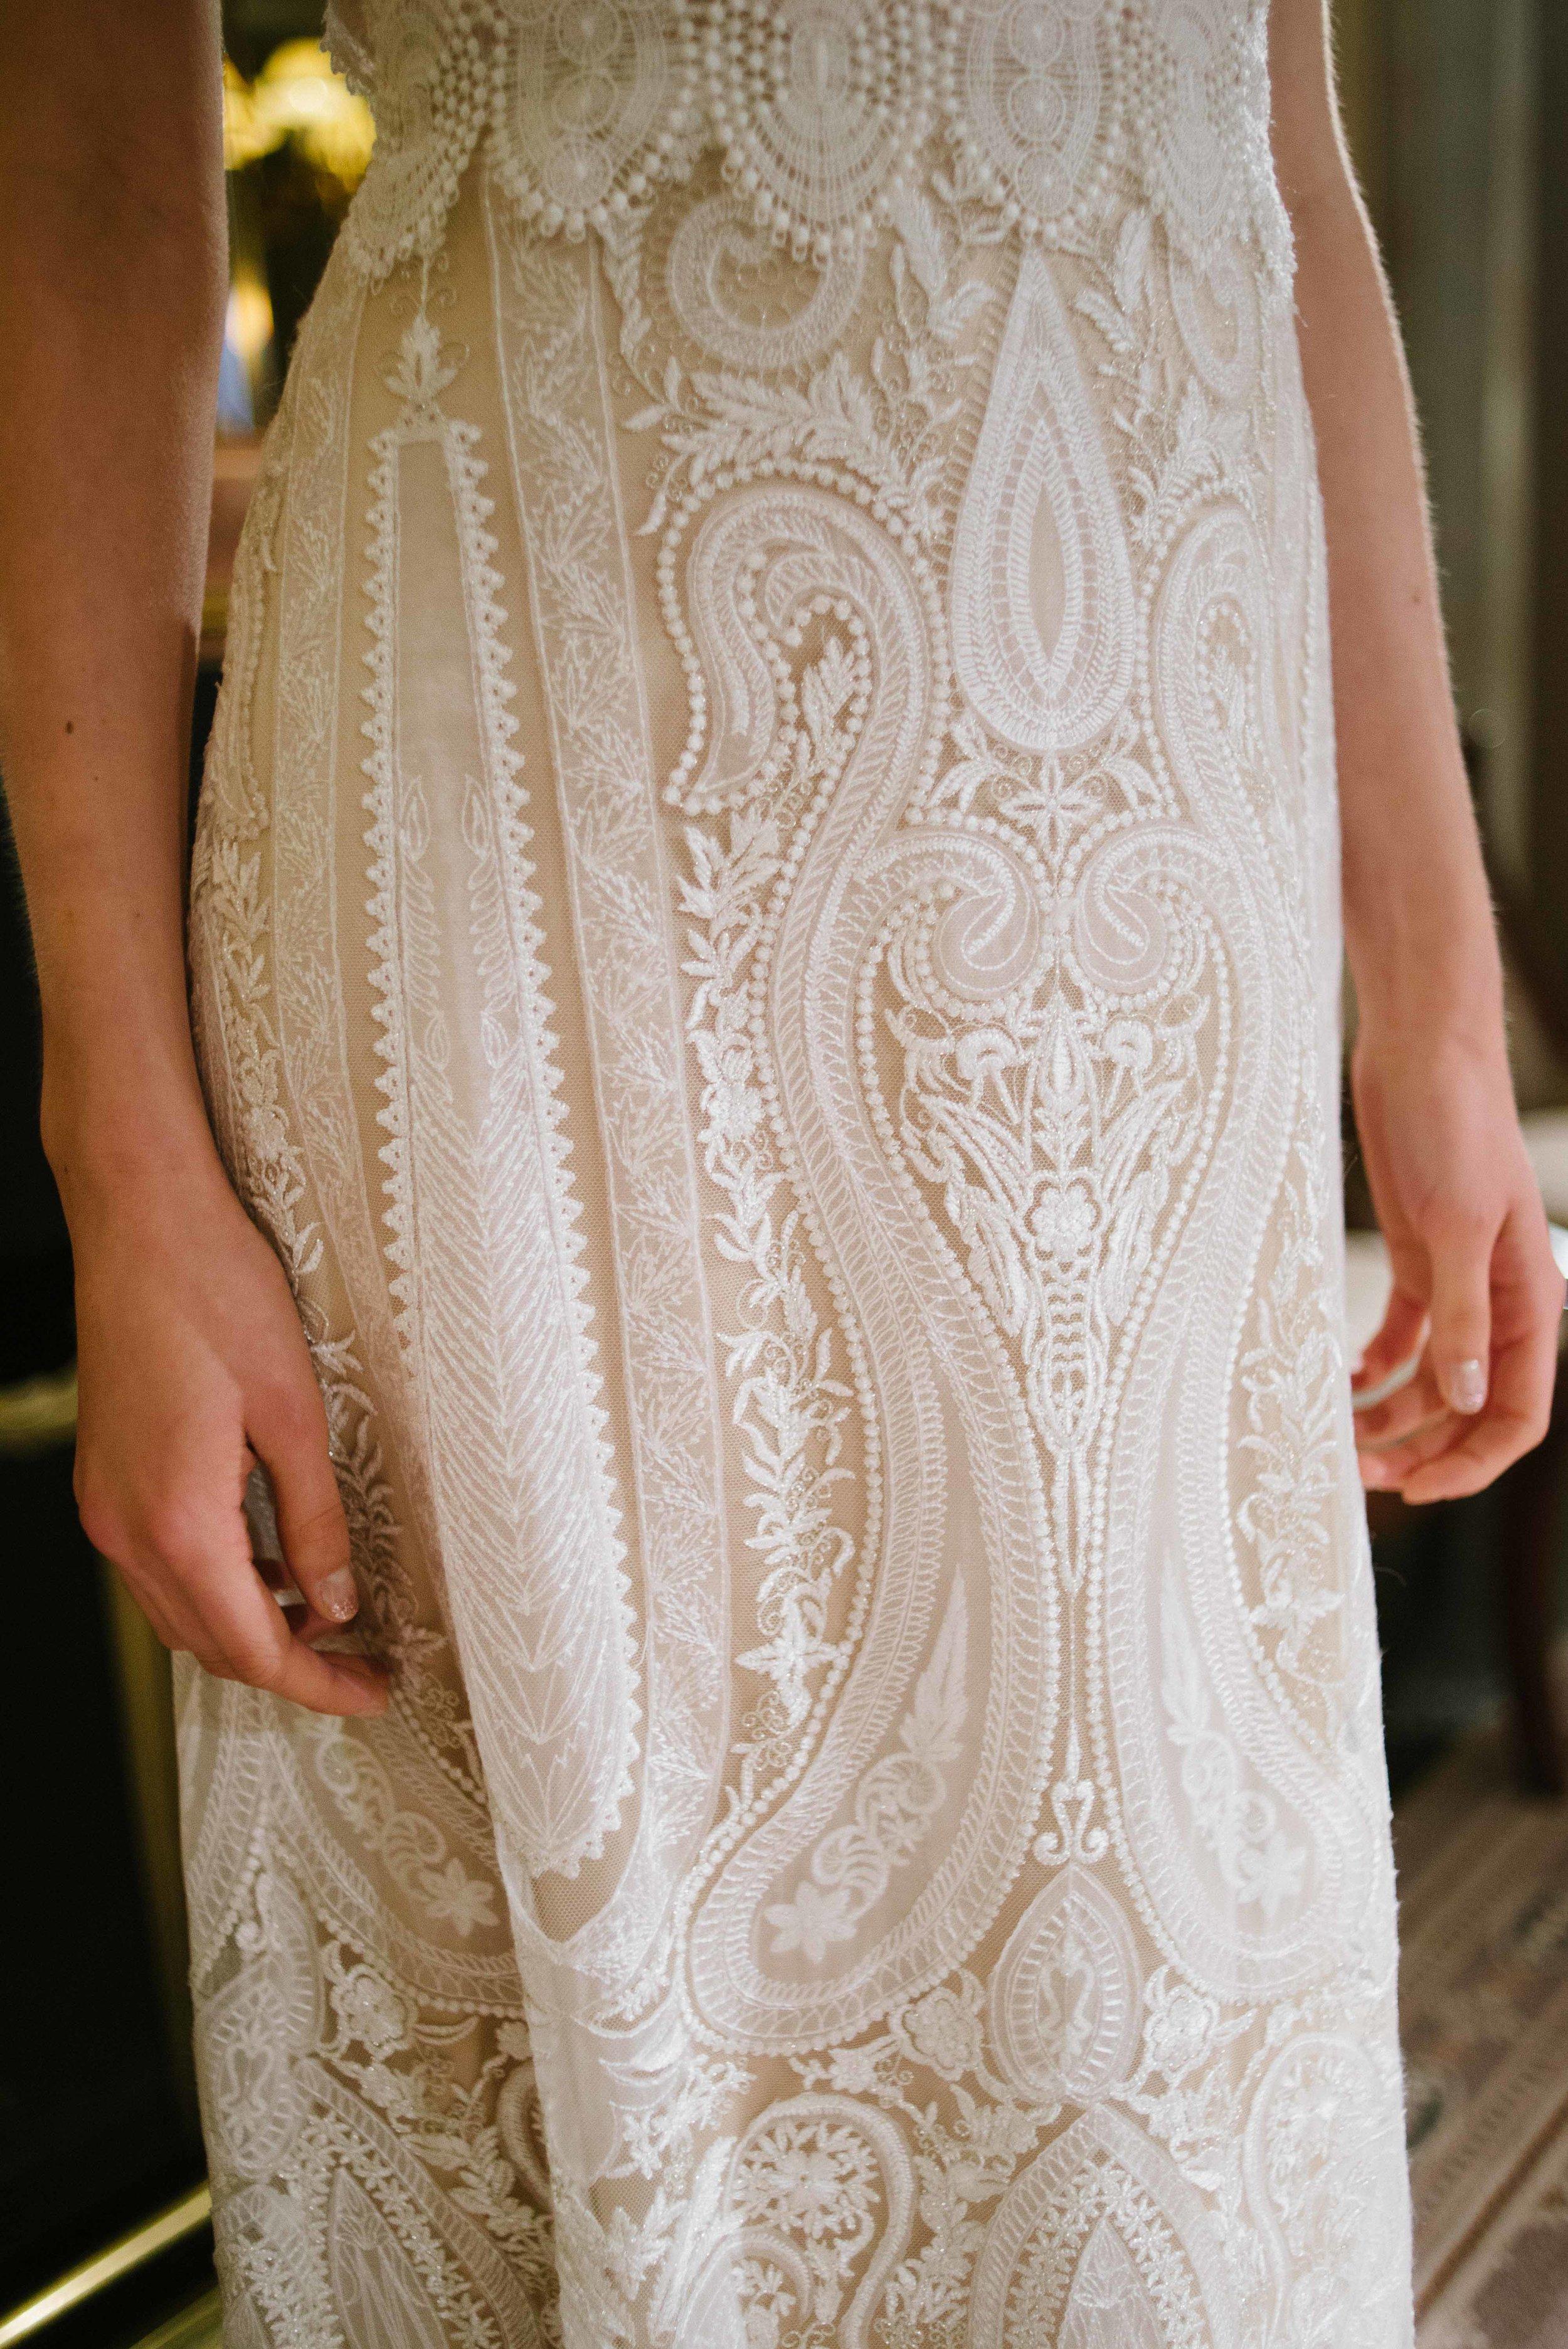 New York Bridal Fashion Week 2016 | Claire Pettibone | Little White Dress Bridal Shop in Denver